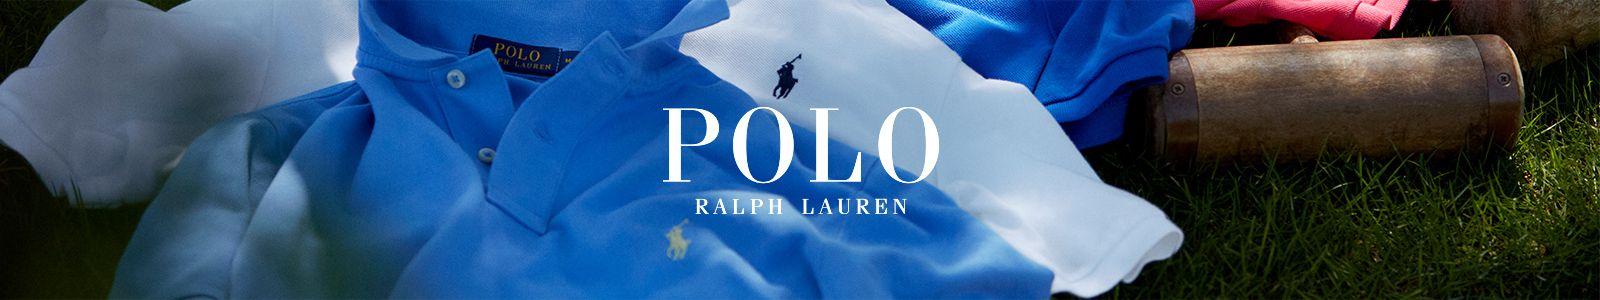 Polo, Ralph Lauren